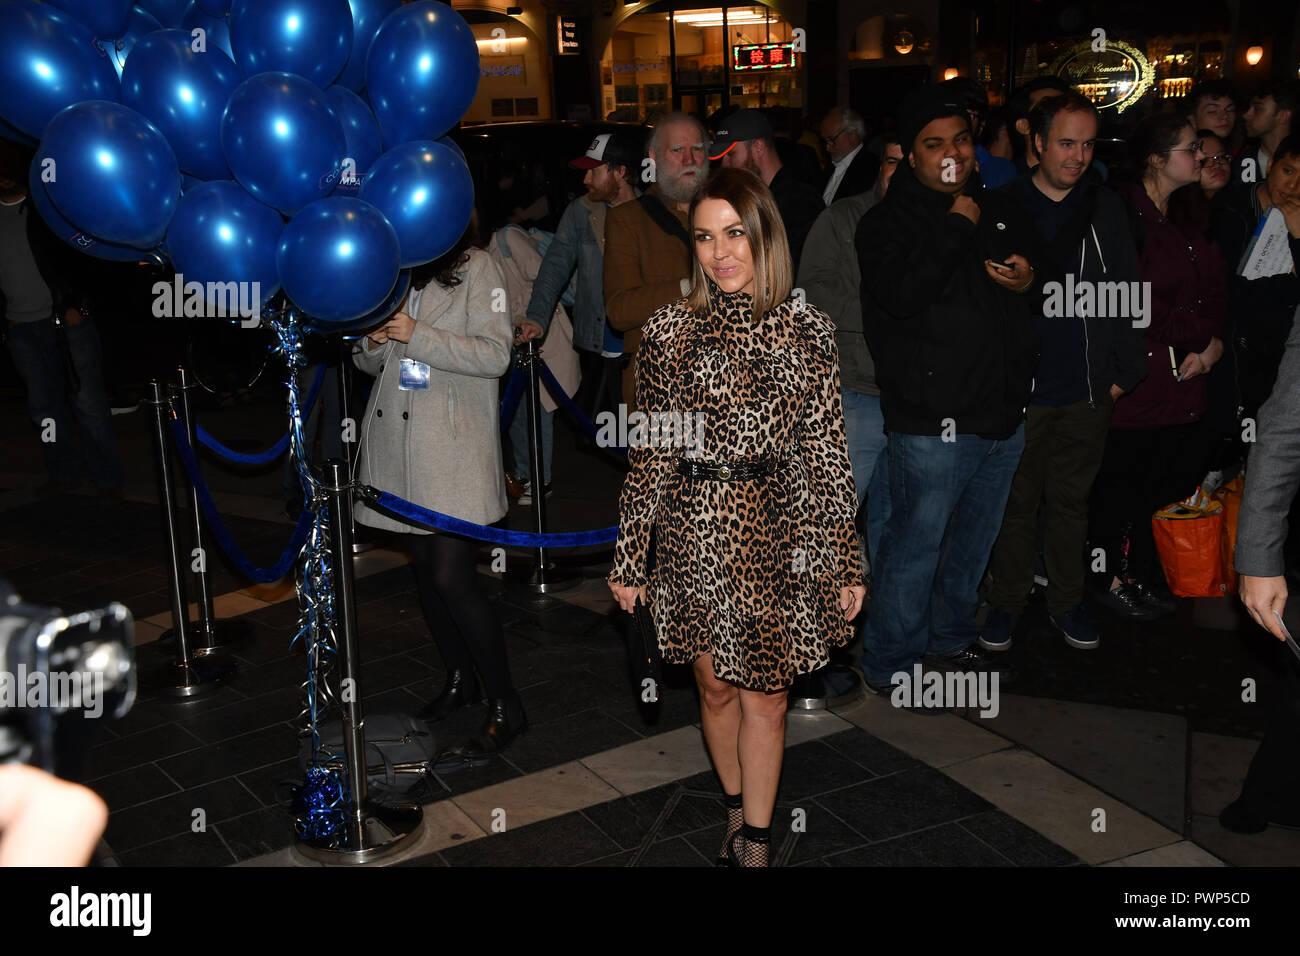 Adele Silva See Through pics. 2018-2019 celebrityes photos leaks! new foto